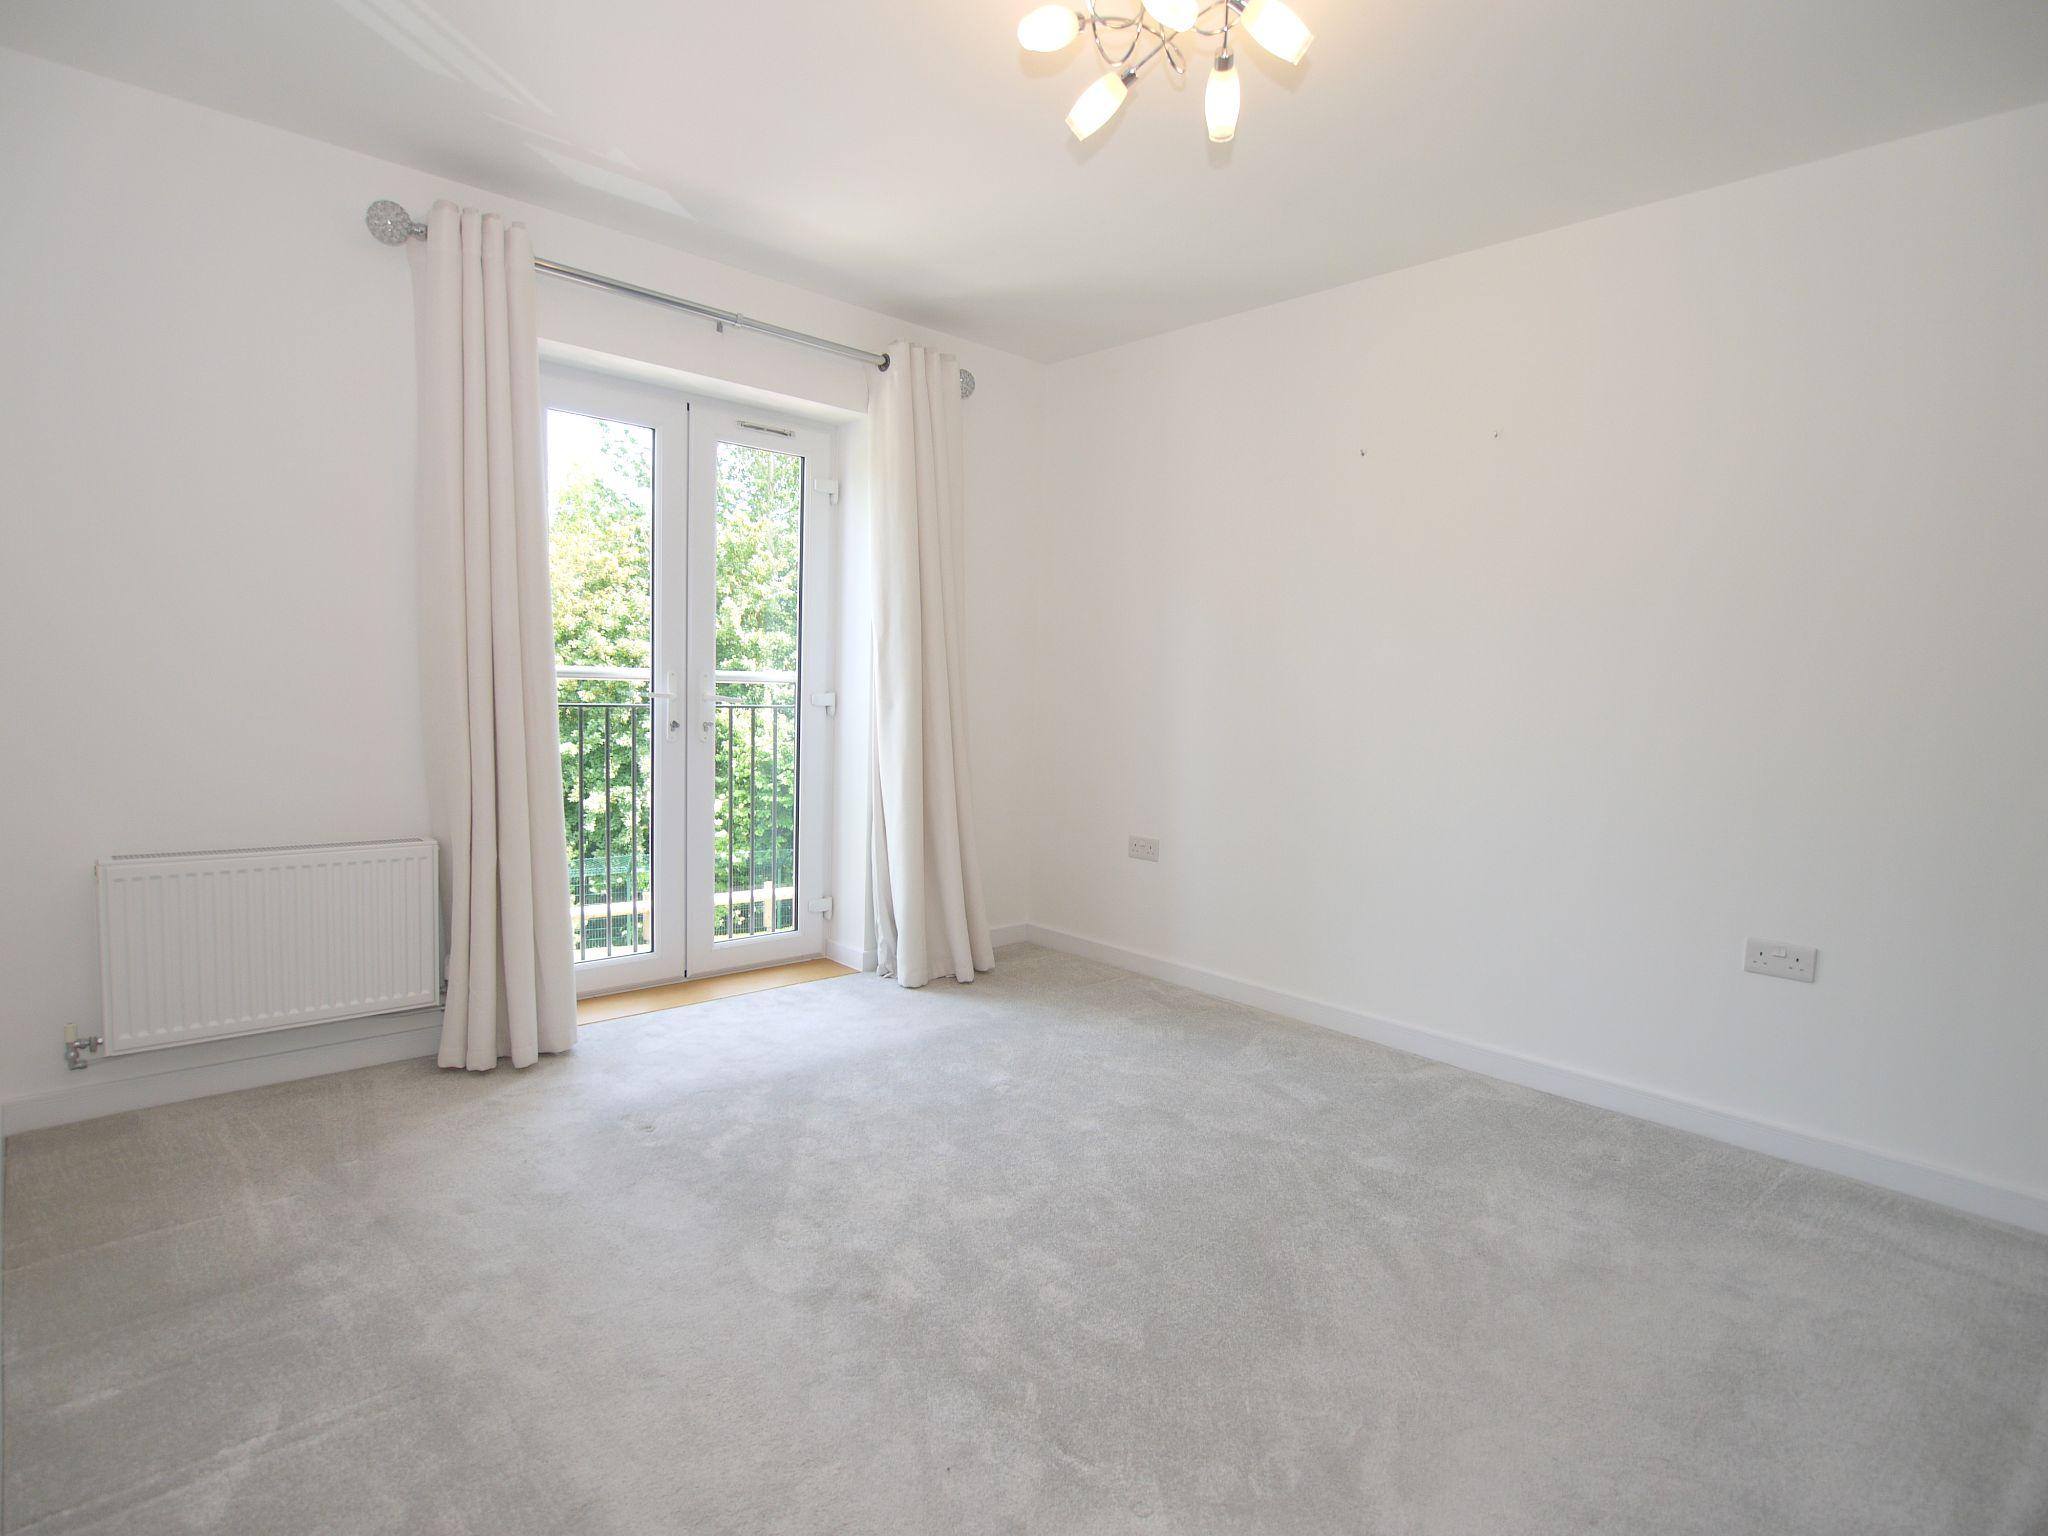 4 bedroom mid terraced house For Sale in Sevenoaks - Photograph 5